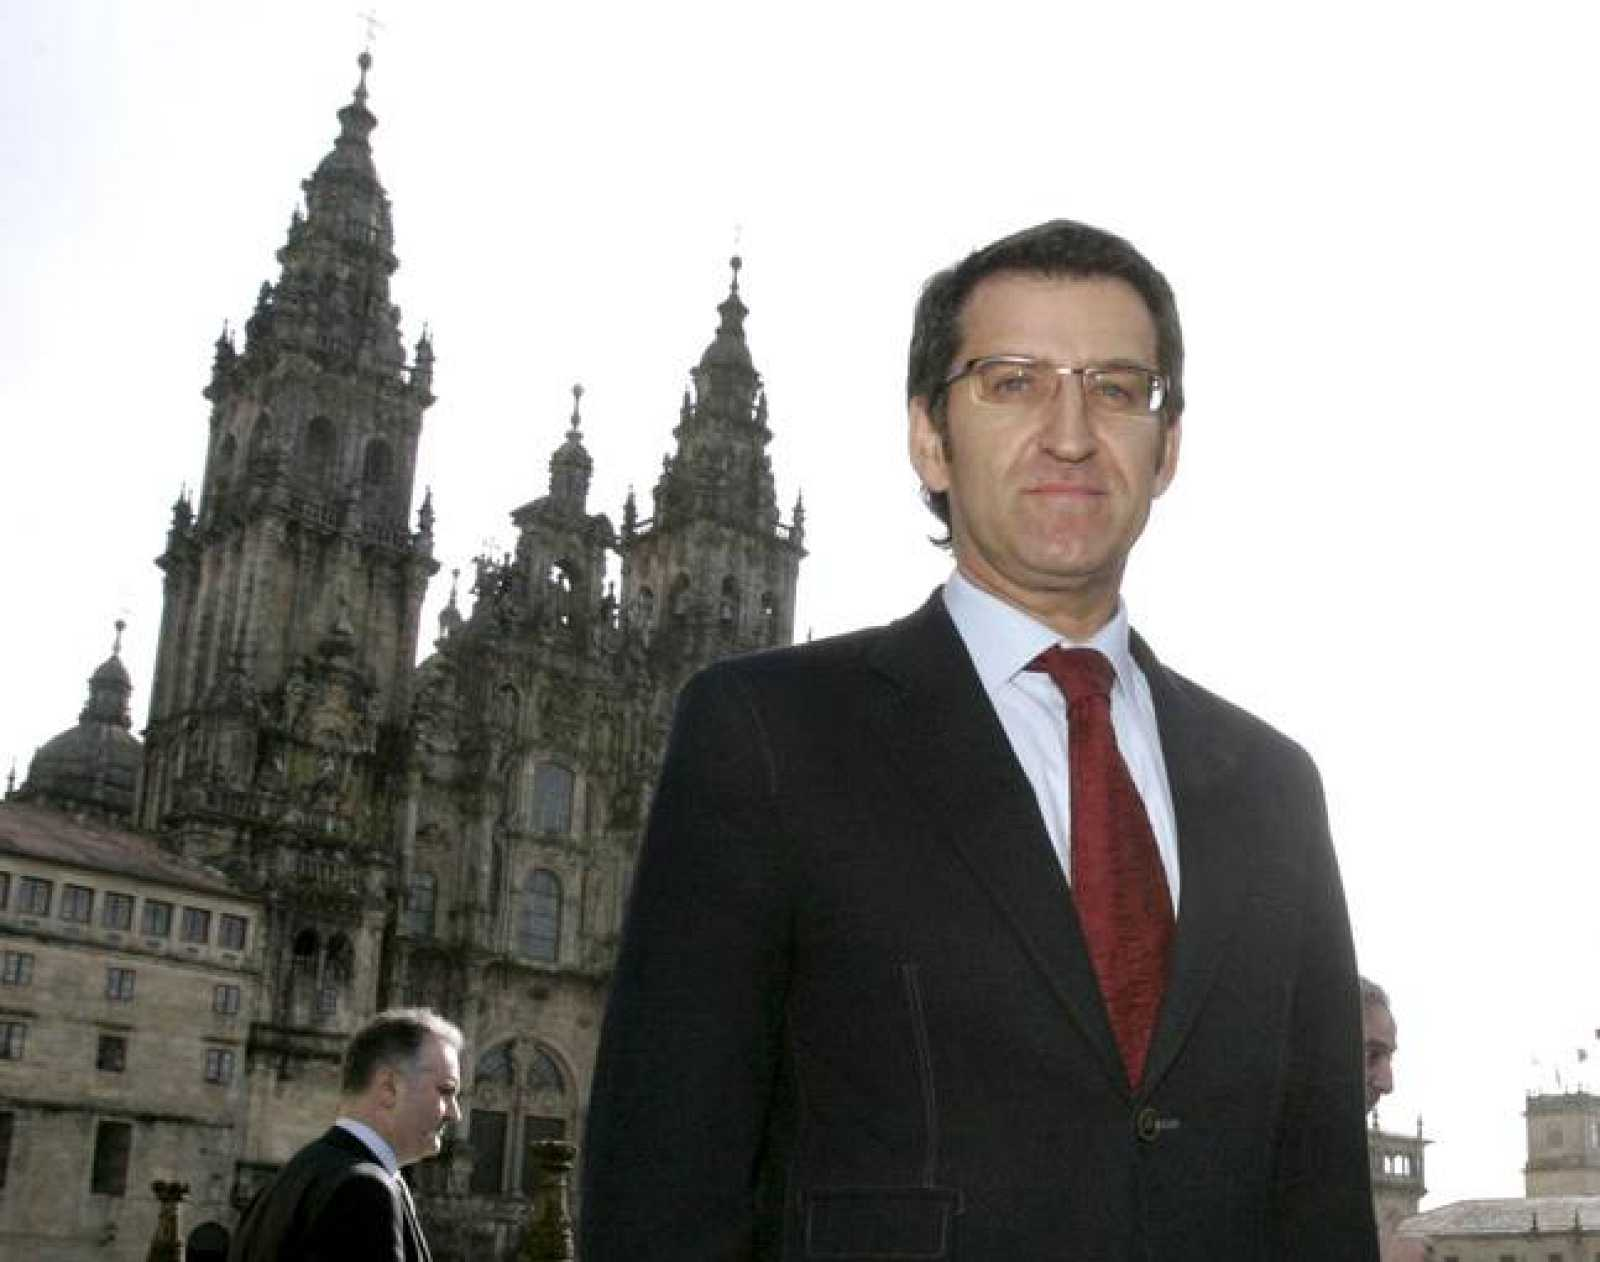 El candidato del PPdeG a la Presidencia de la Xunta, Alberto Núñez Feijóo.